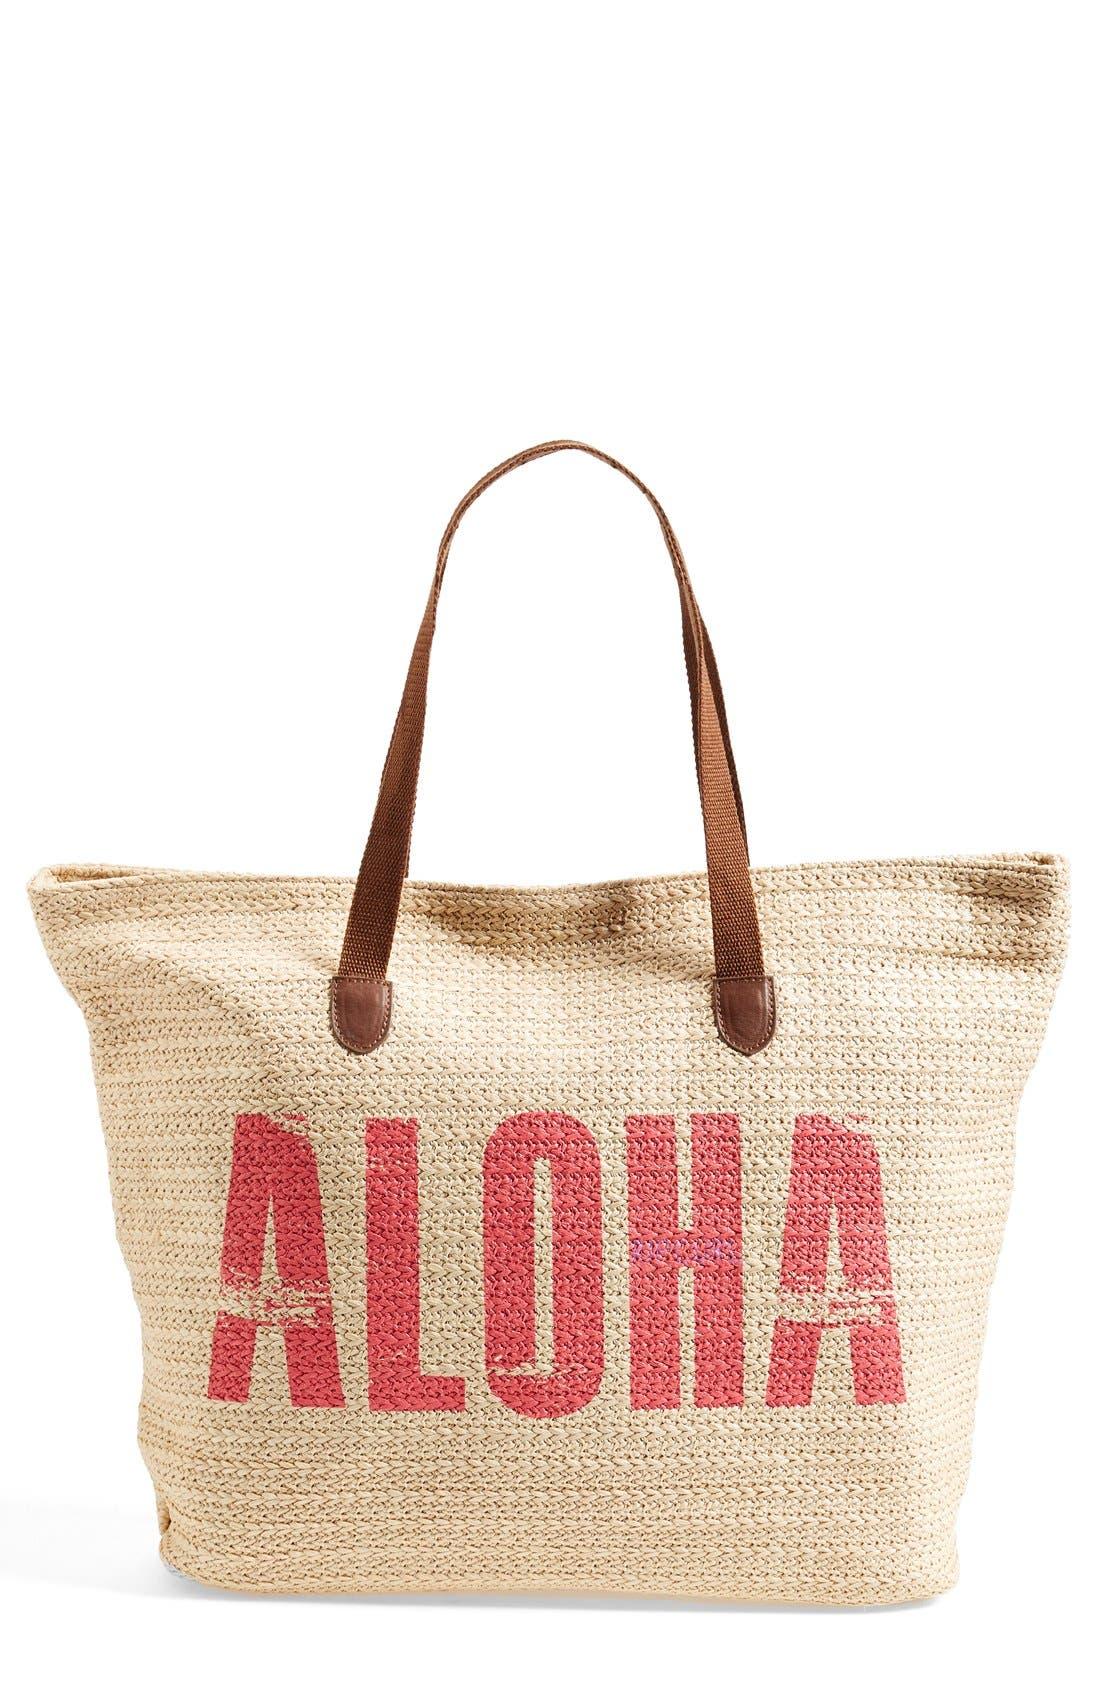 Main Image - Rip Curl 'Aloha' Beach Bag